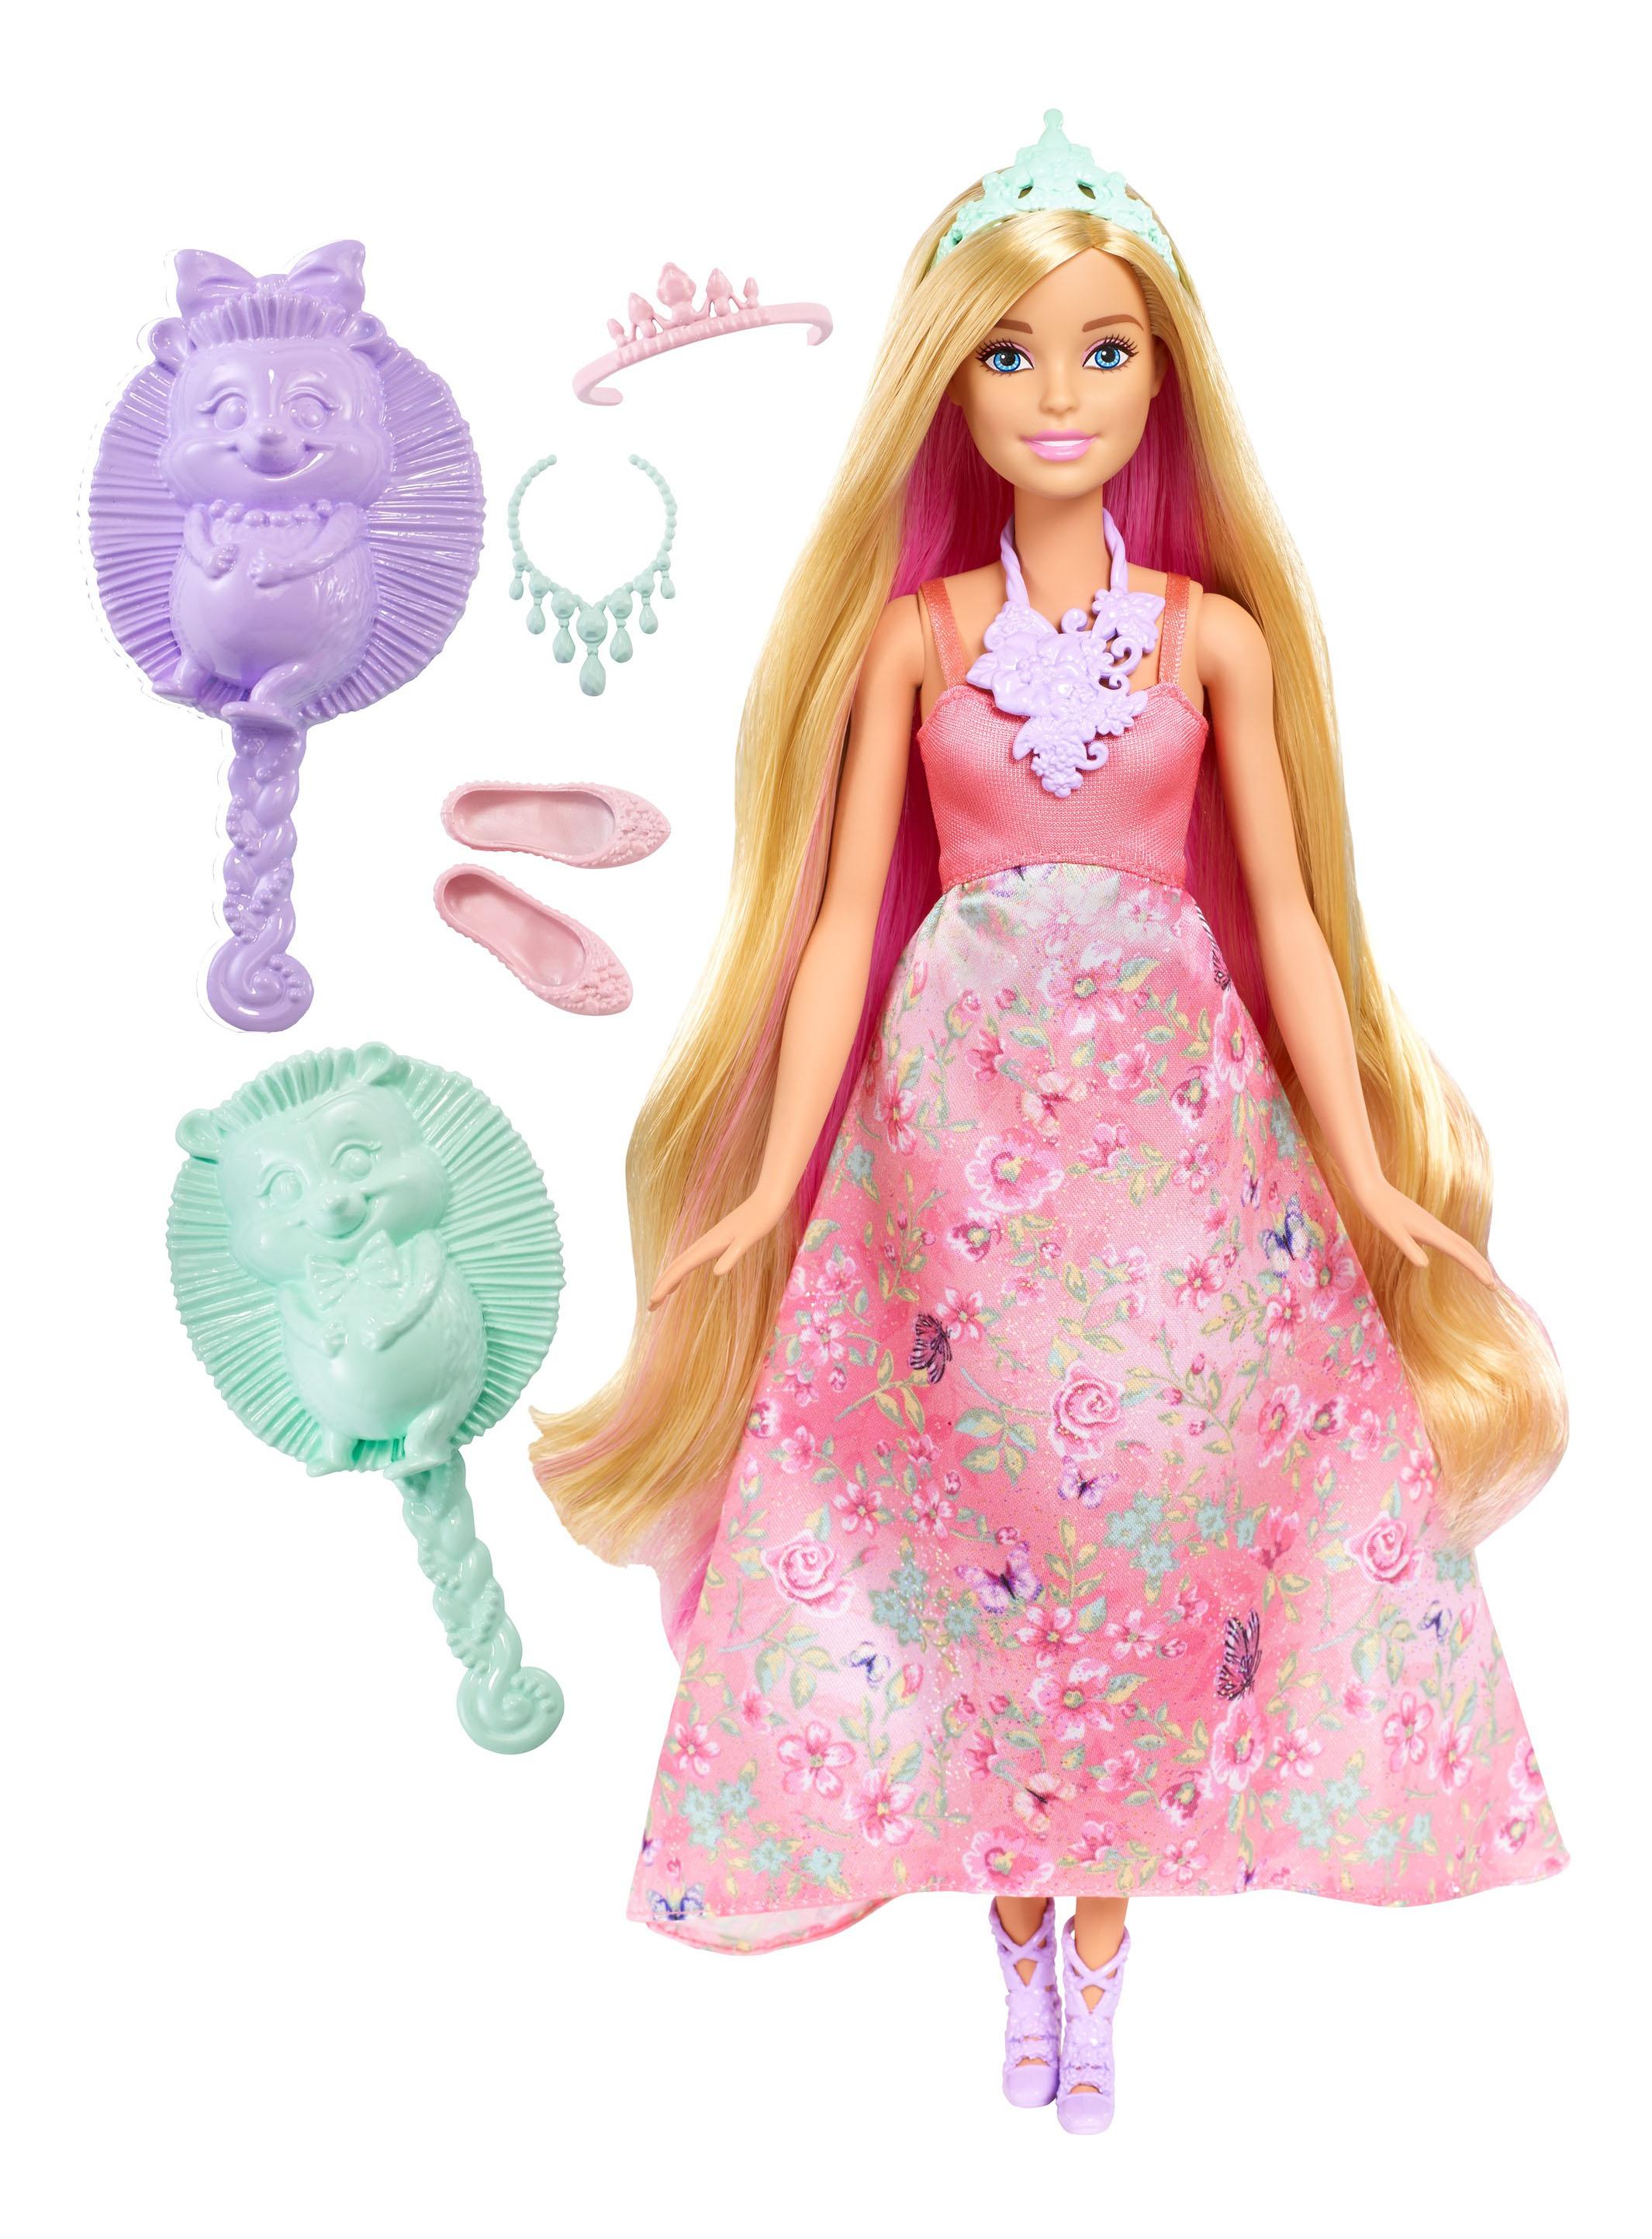 Купить Кукла Barbie Принцесса с волшебными волосами DWH41 DWH42, Куклы Barbie